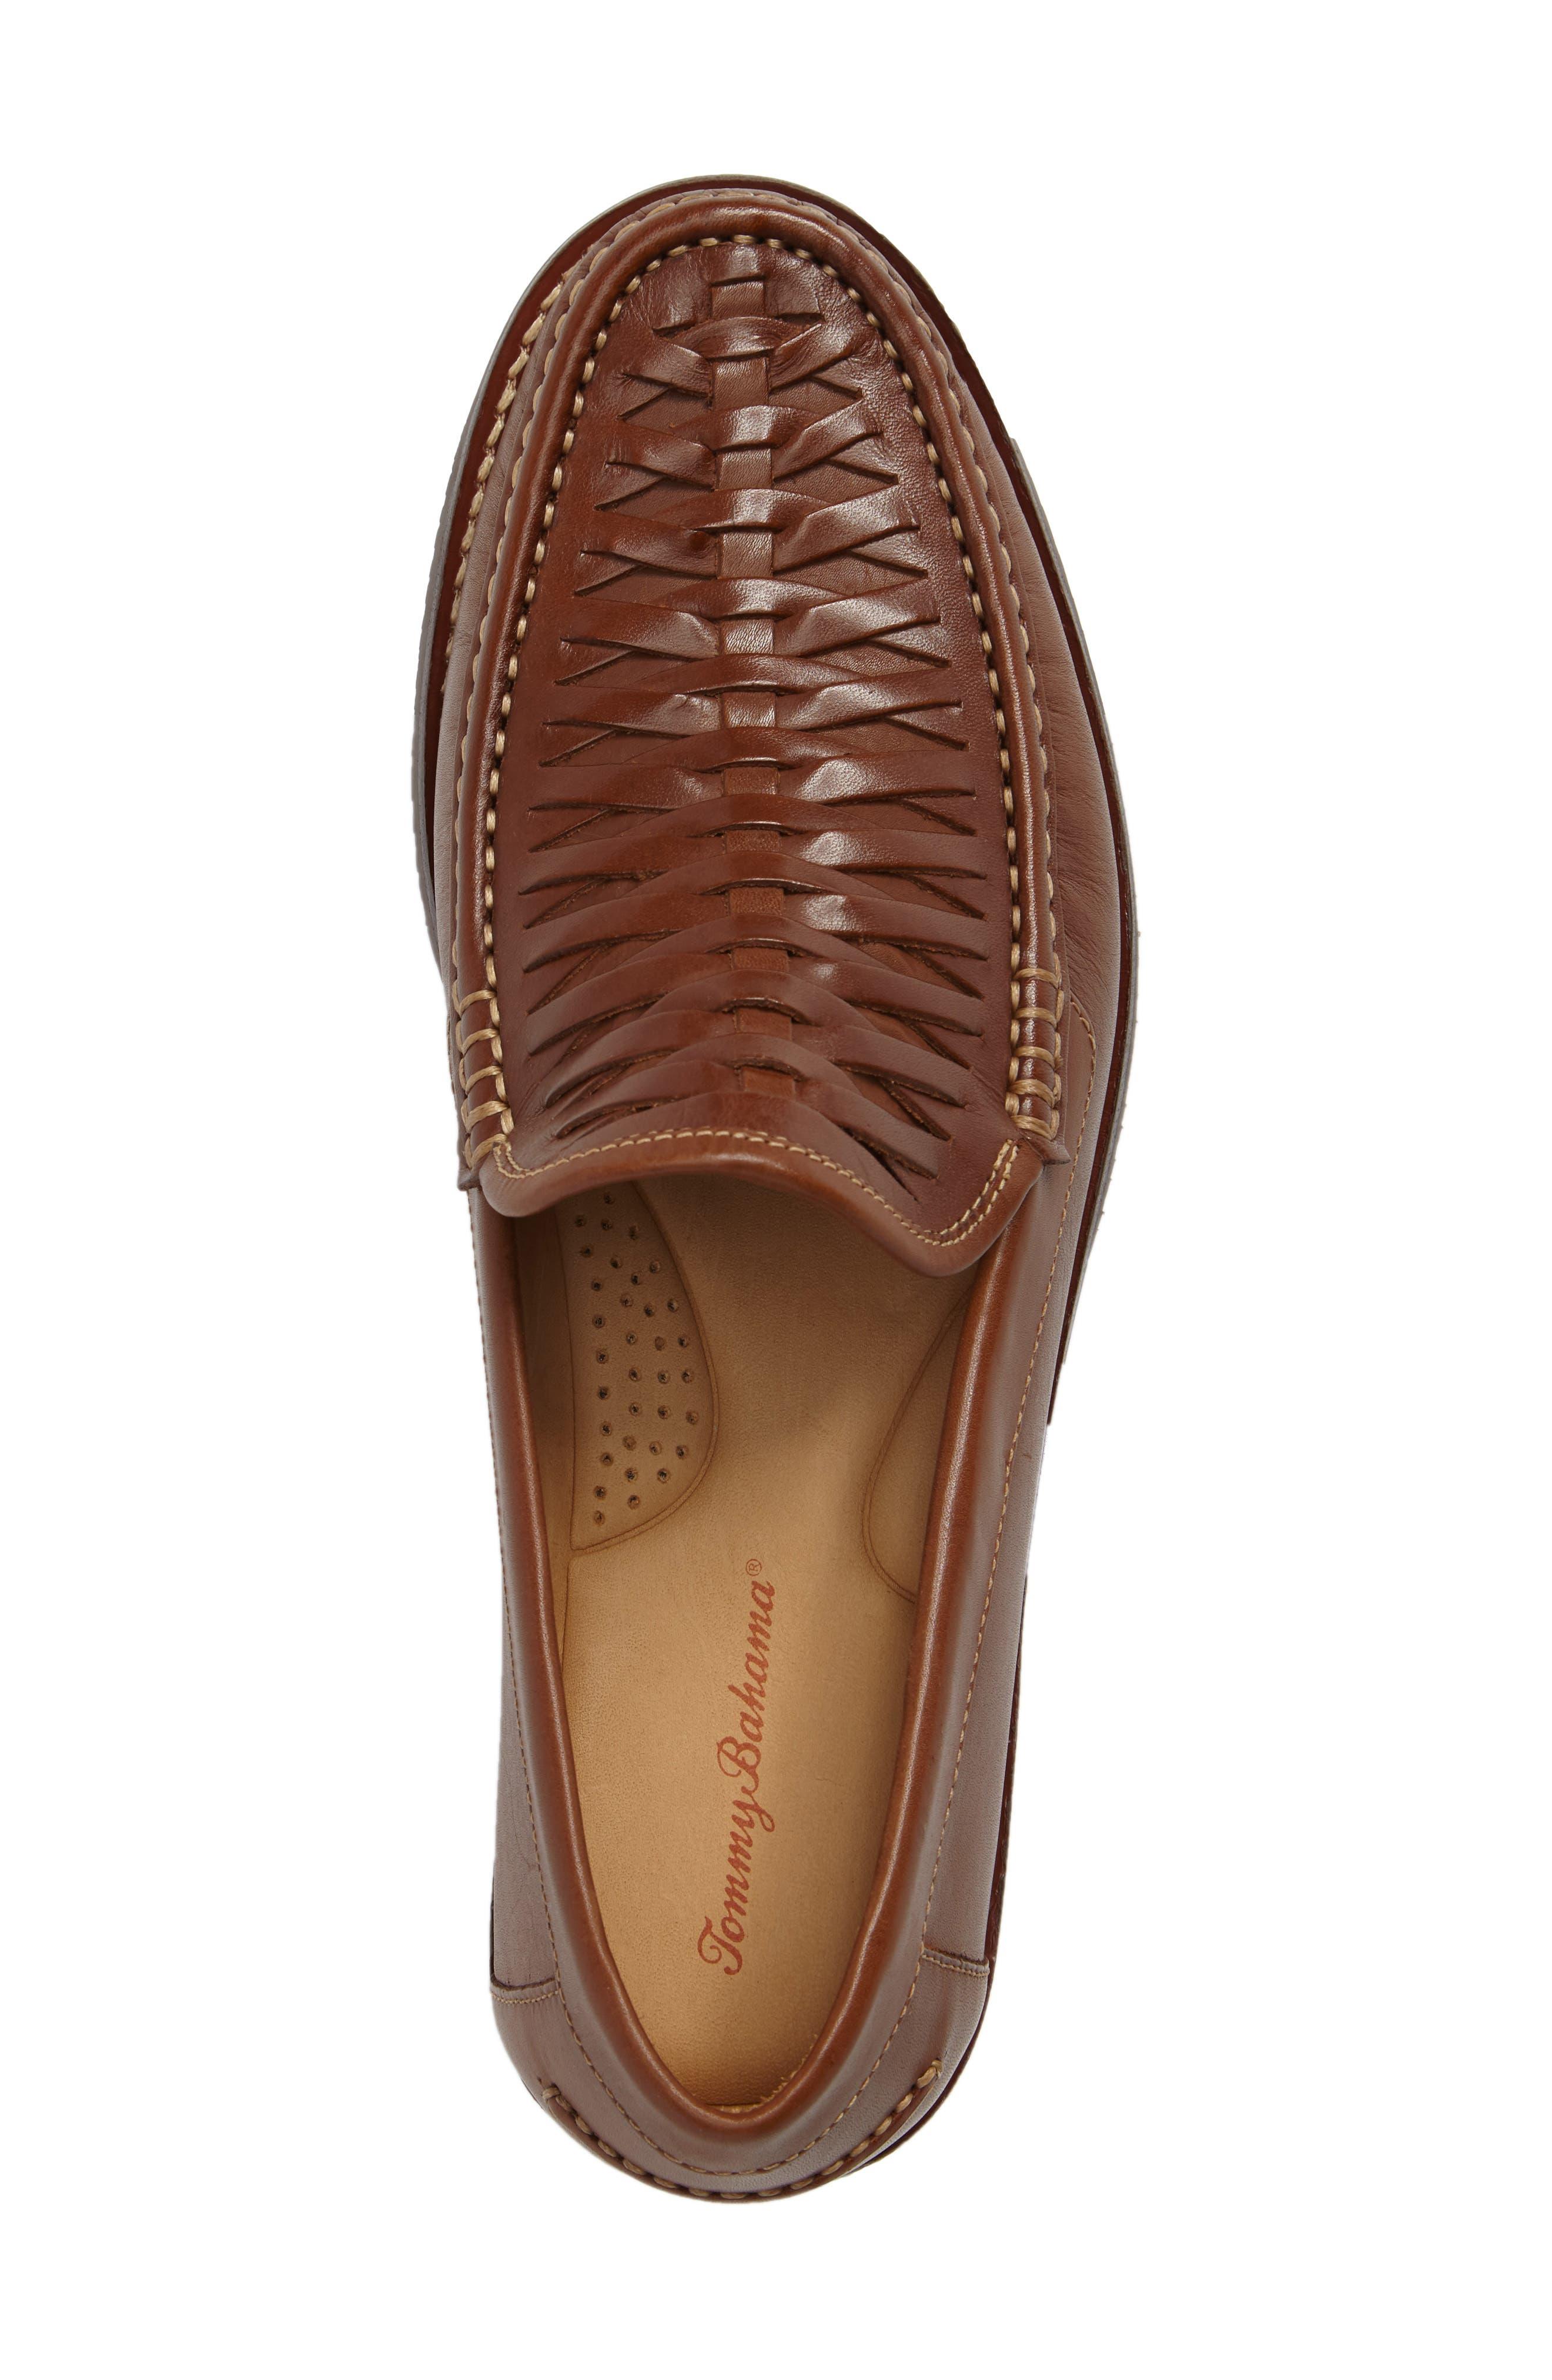 Fynn Loafer,                             Alternate thumbnail 5, color,                             Saddle Brown Leather